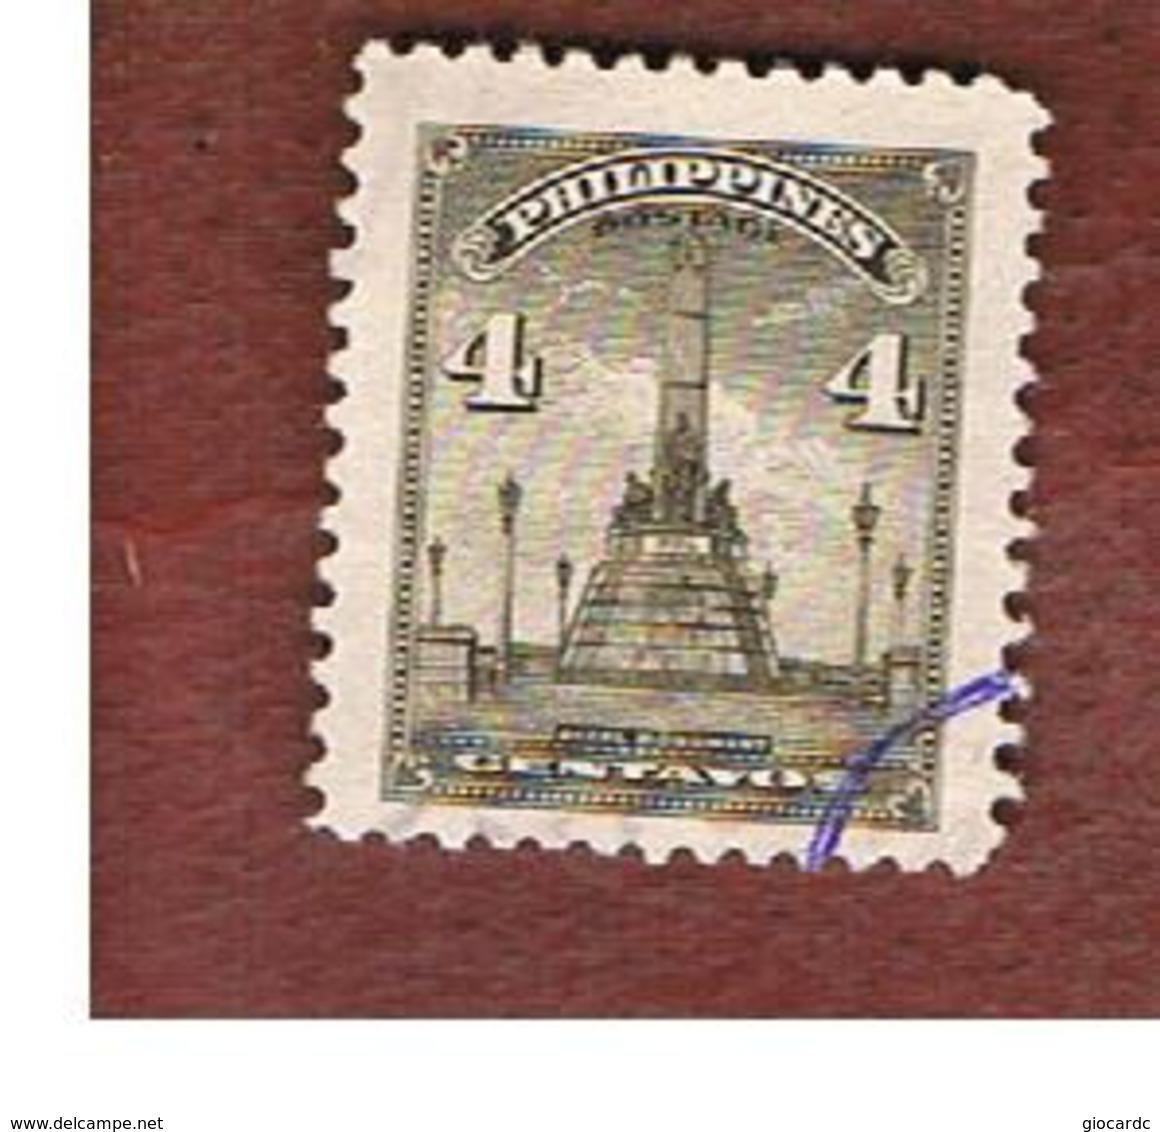 FILIPPINE (PHILIPPINES) - SG 629  -  1947   RIZAL MONUMENT      - USED ° - Filippine